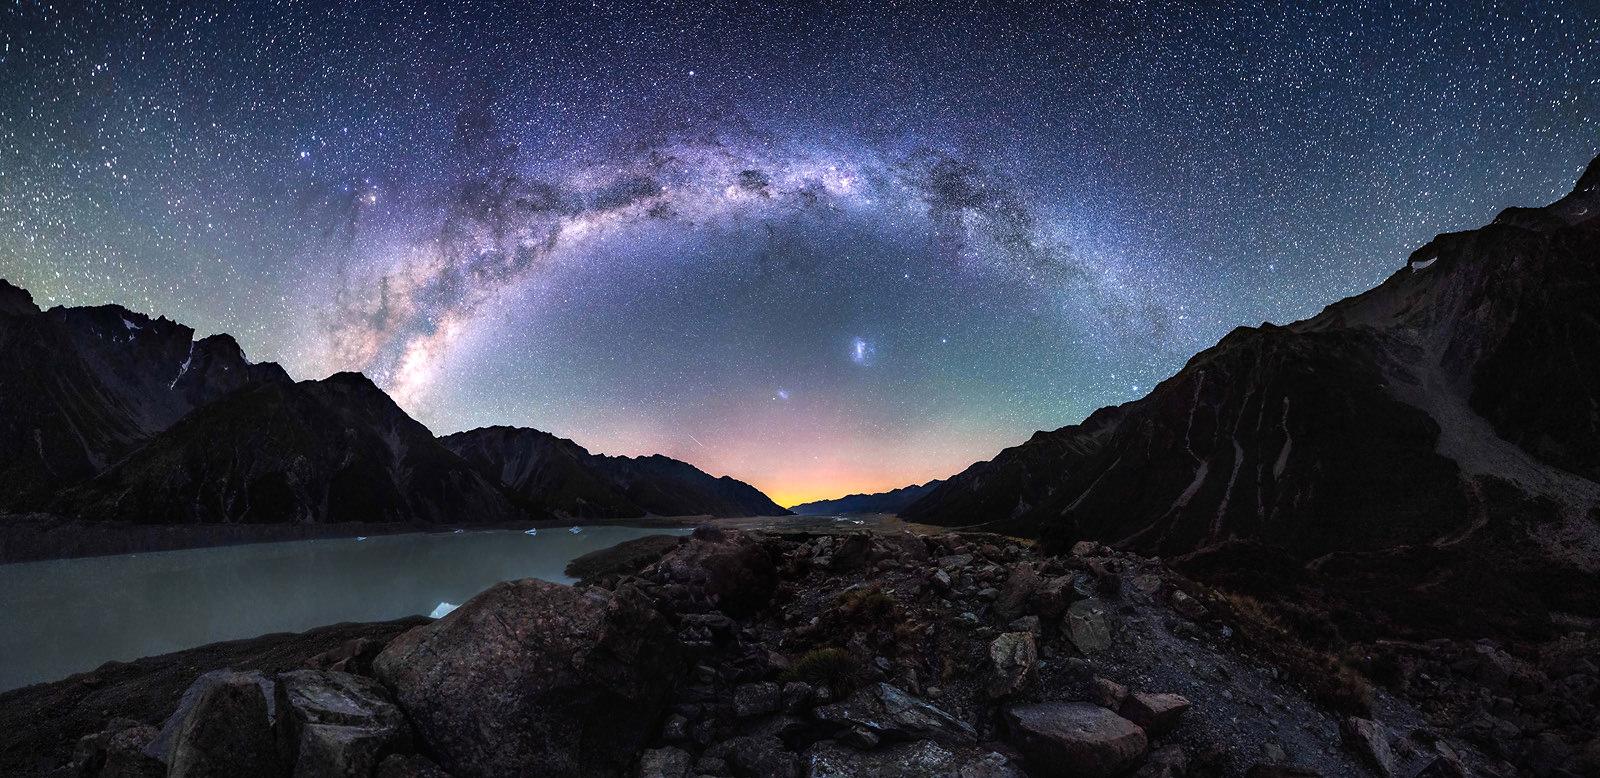 valley-Of-Stars